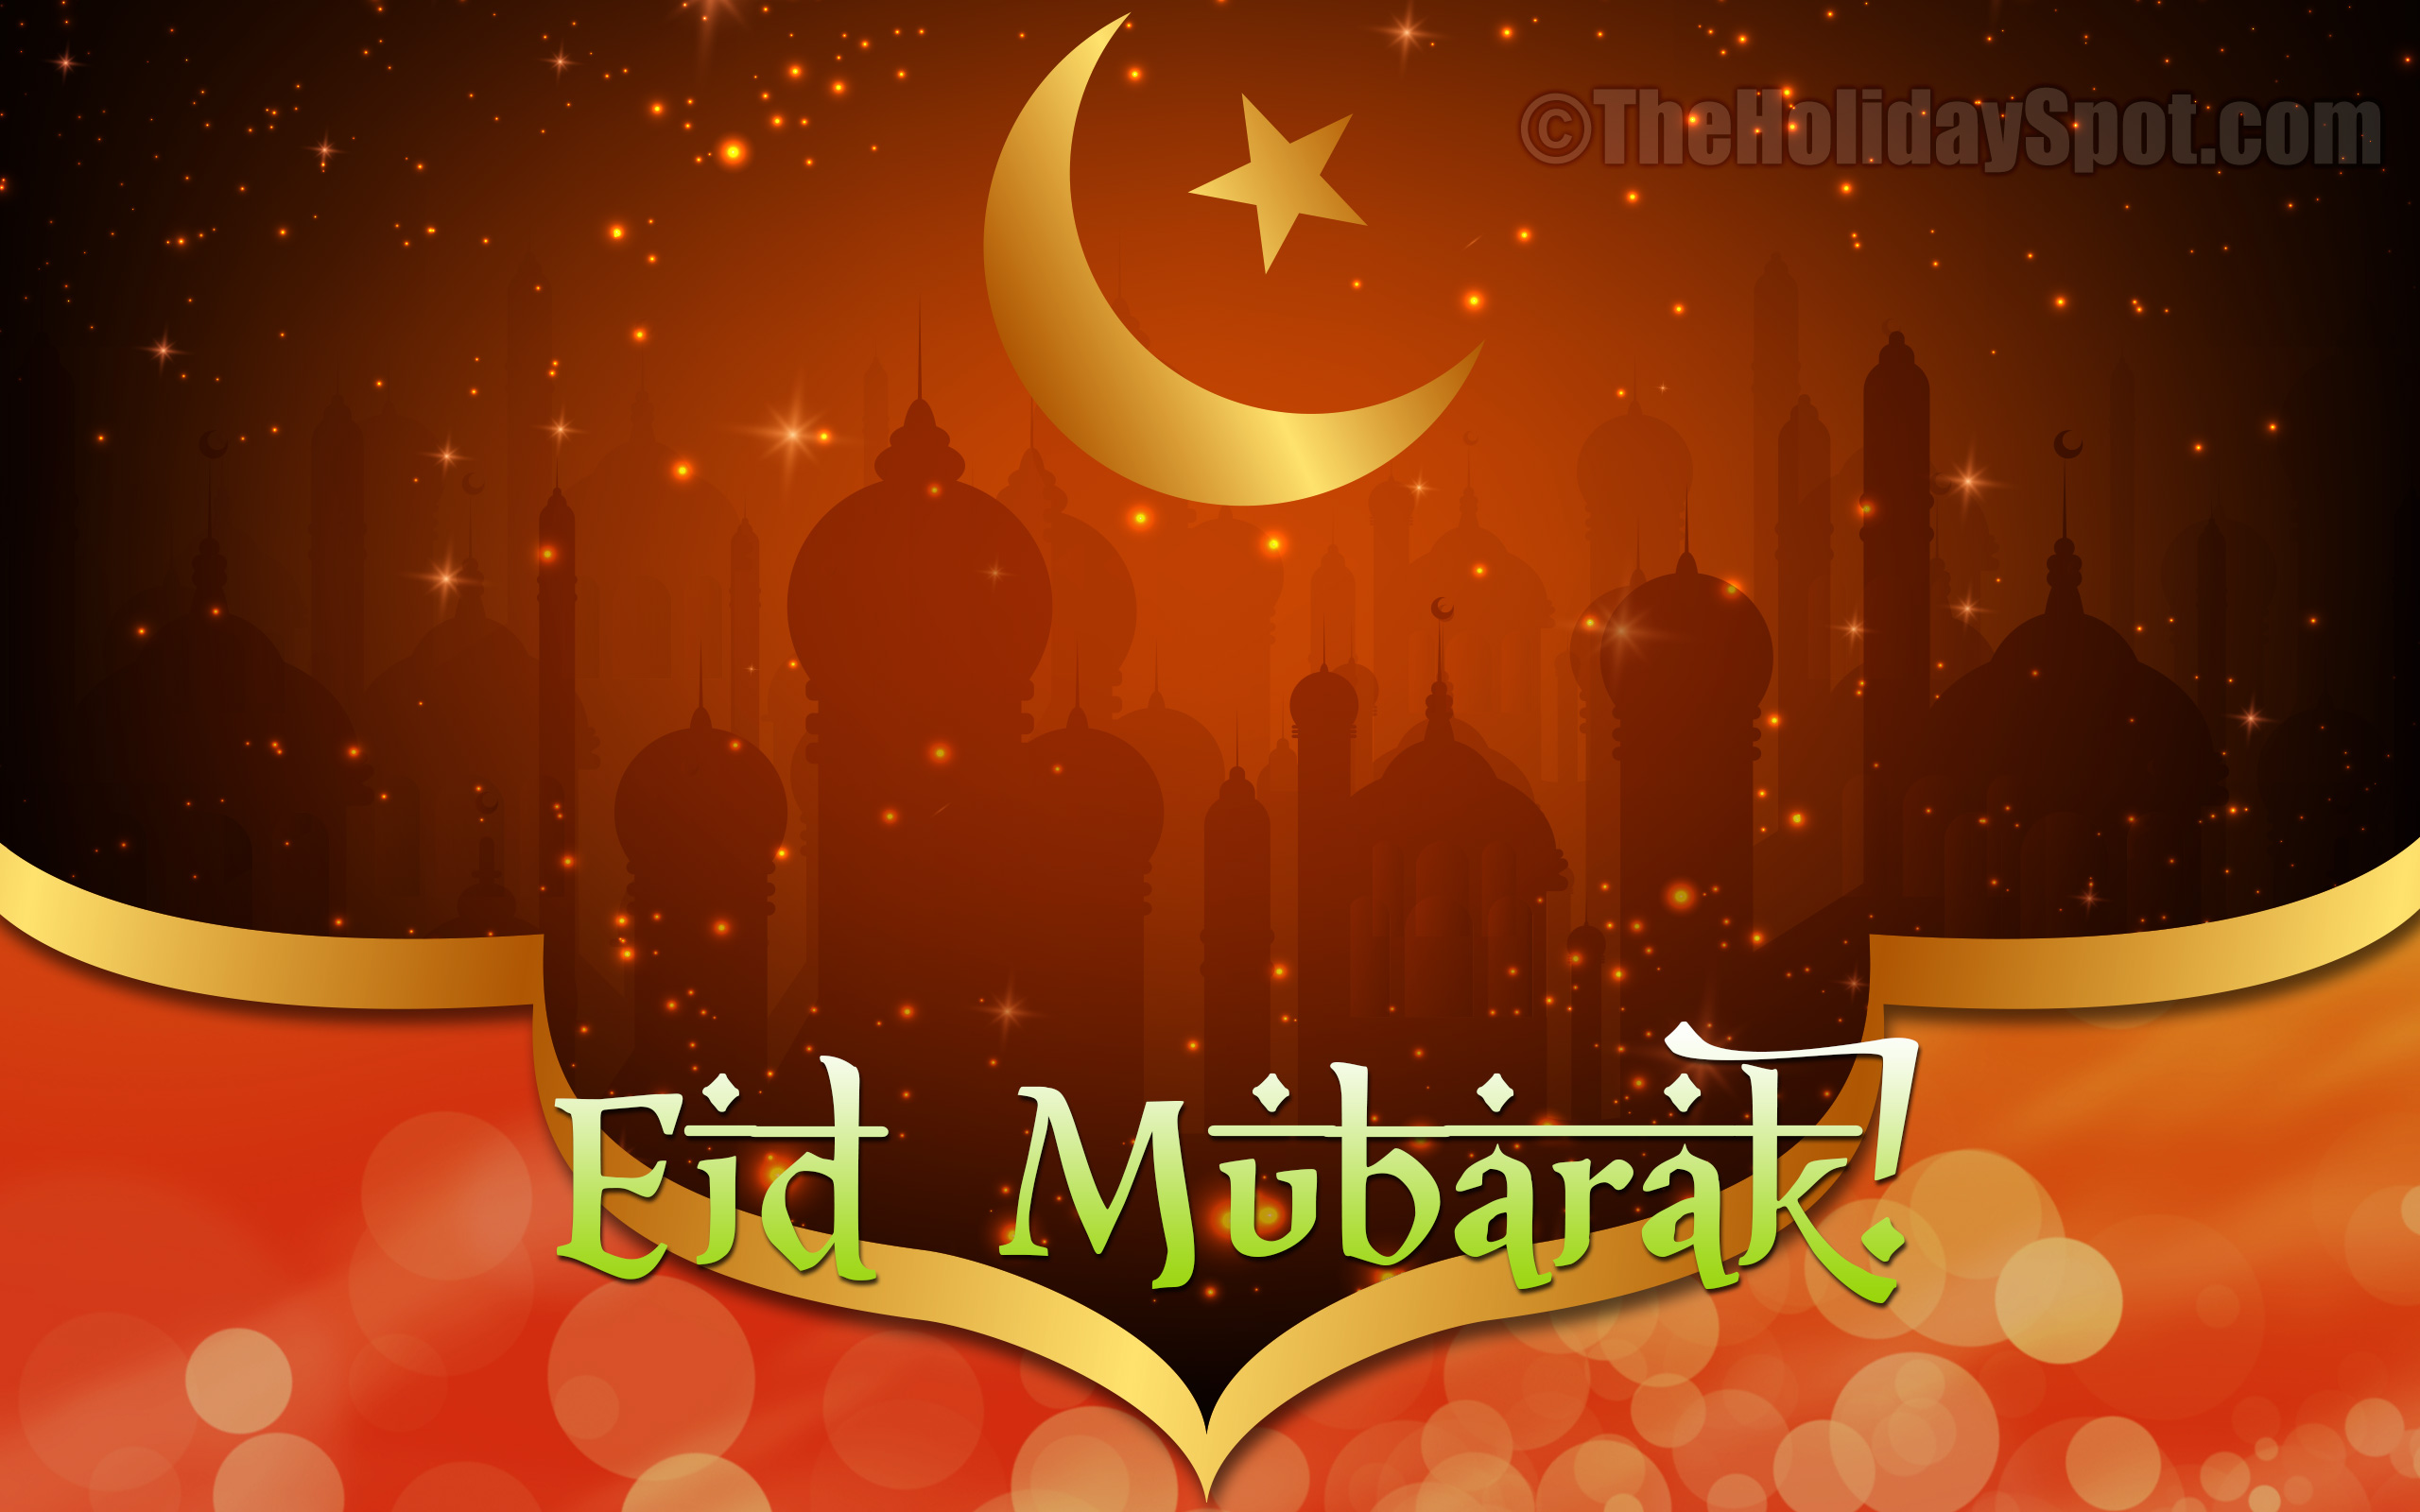 Eid-Ul-Adha Mubarak Picture Images 2019 | Eid-ul-Adha Hd ...